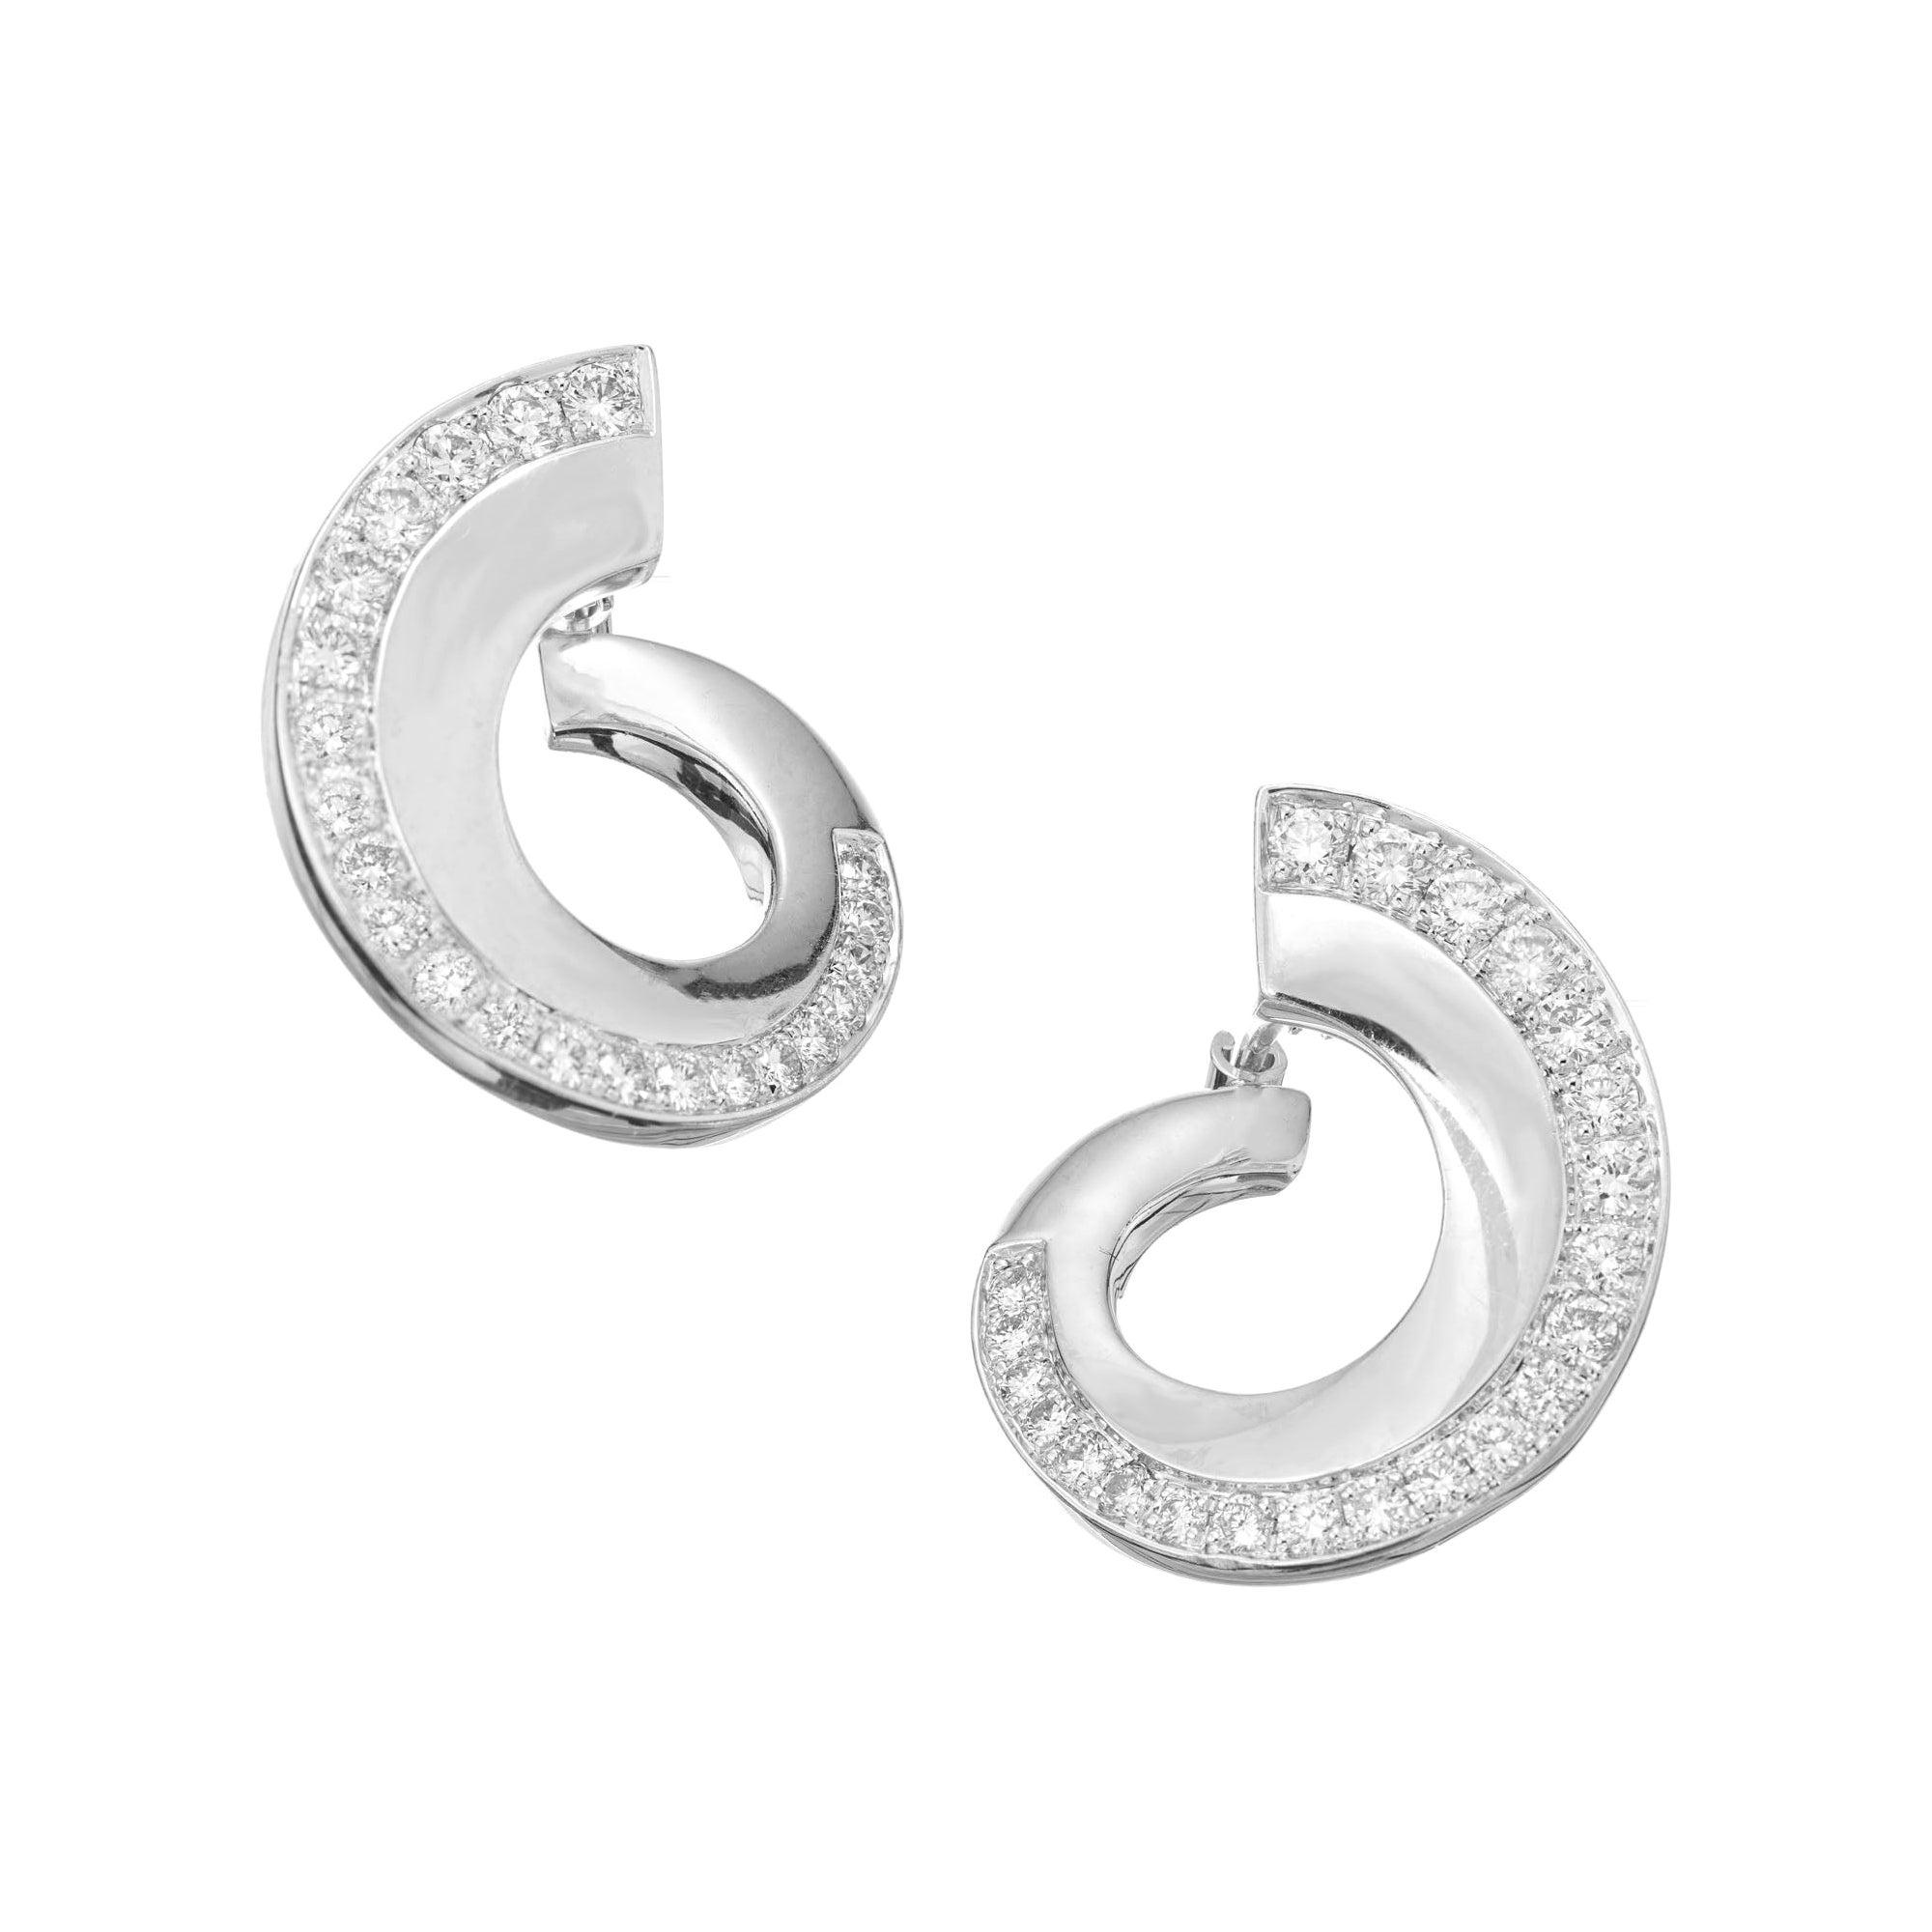 .75 Carat Diamond White Gold Swirl Earrings